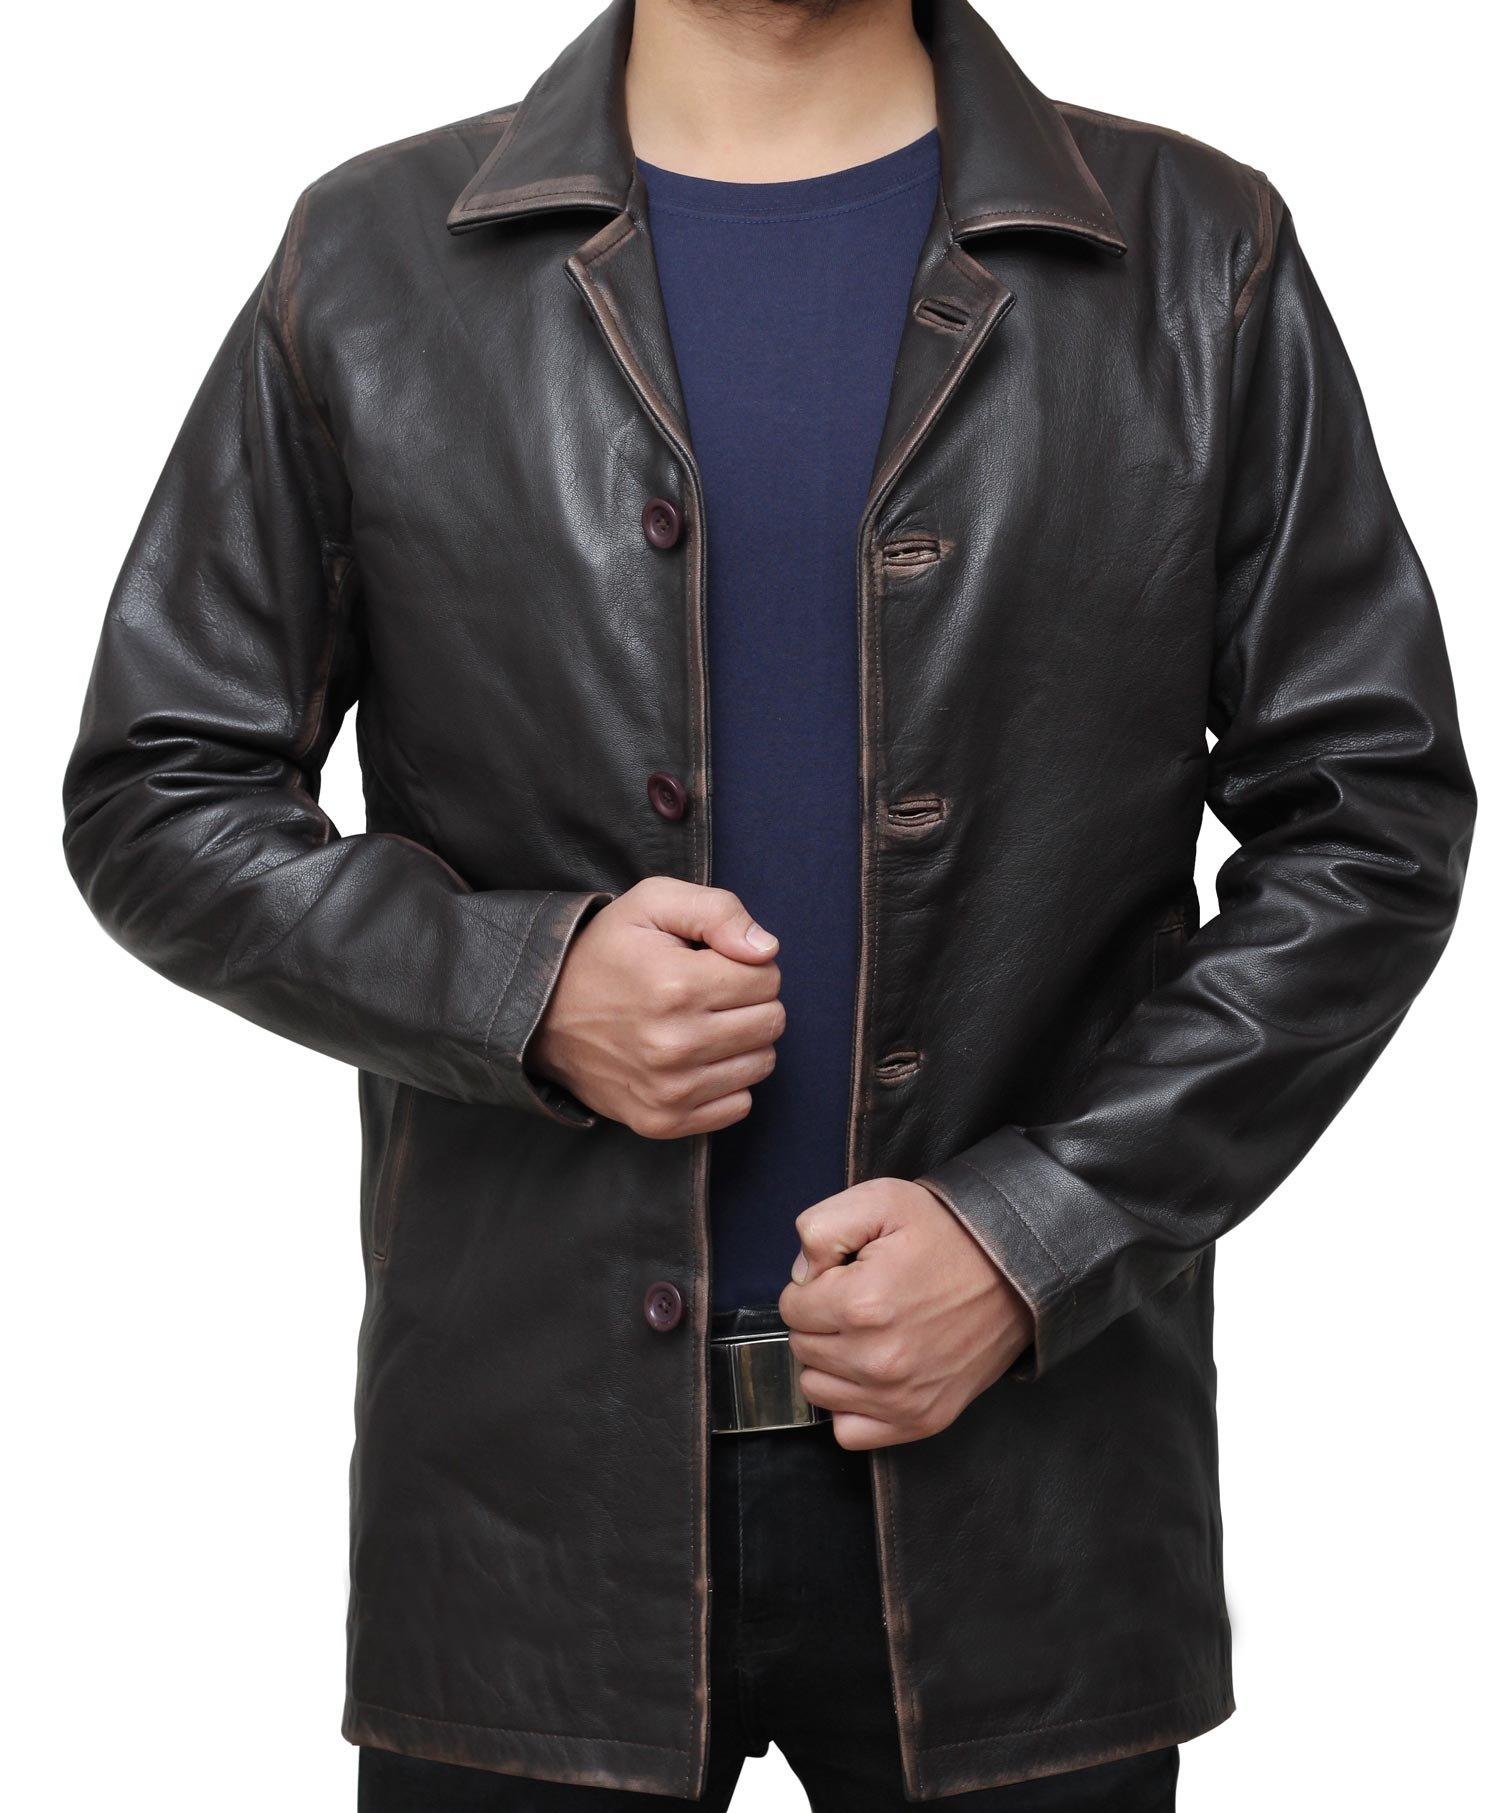 Dark Brown Leather Jacket Coat - Supernatural Distressed   M